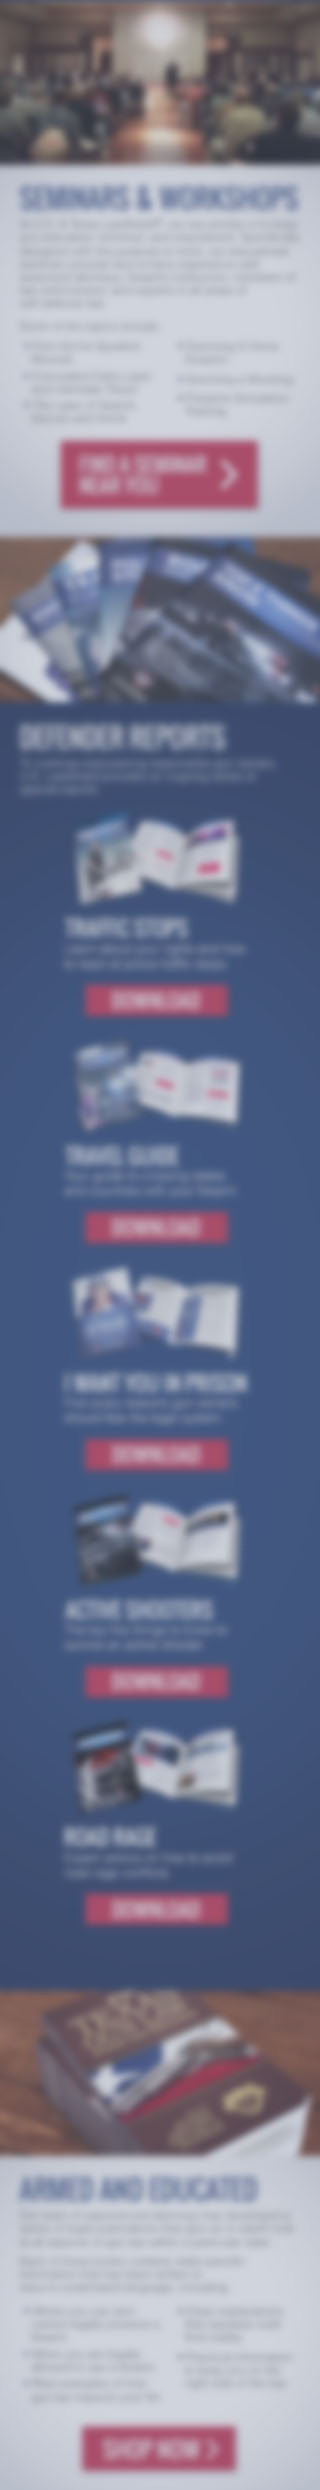 Blurred Premium Content Preview